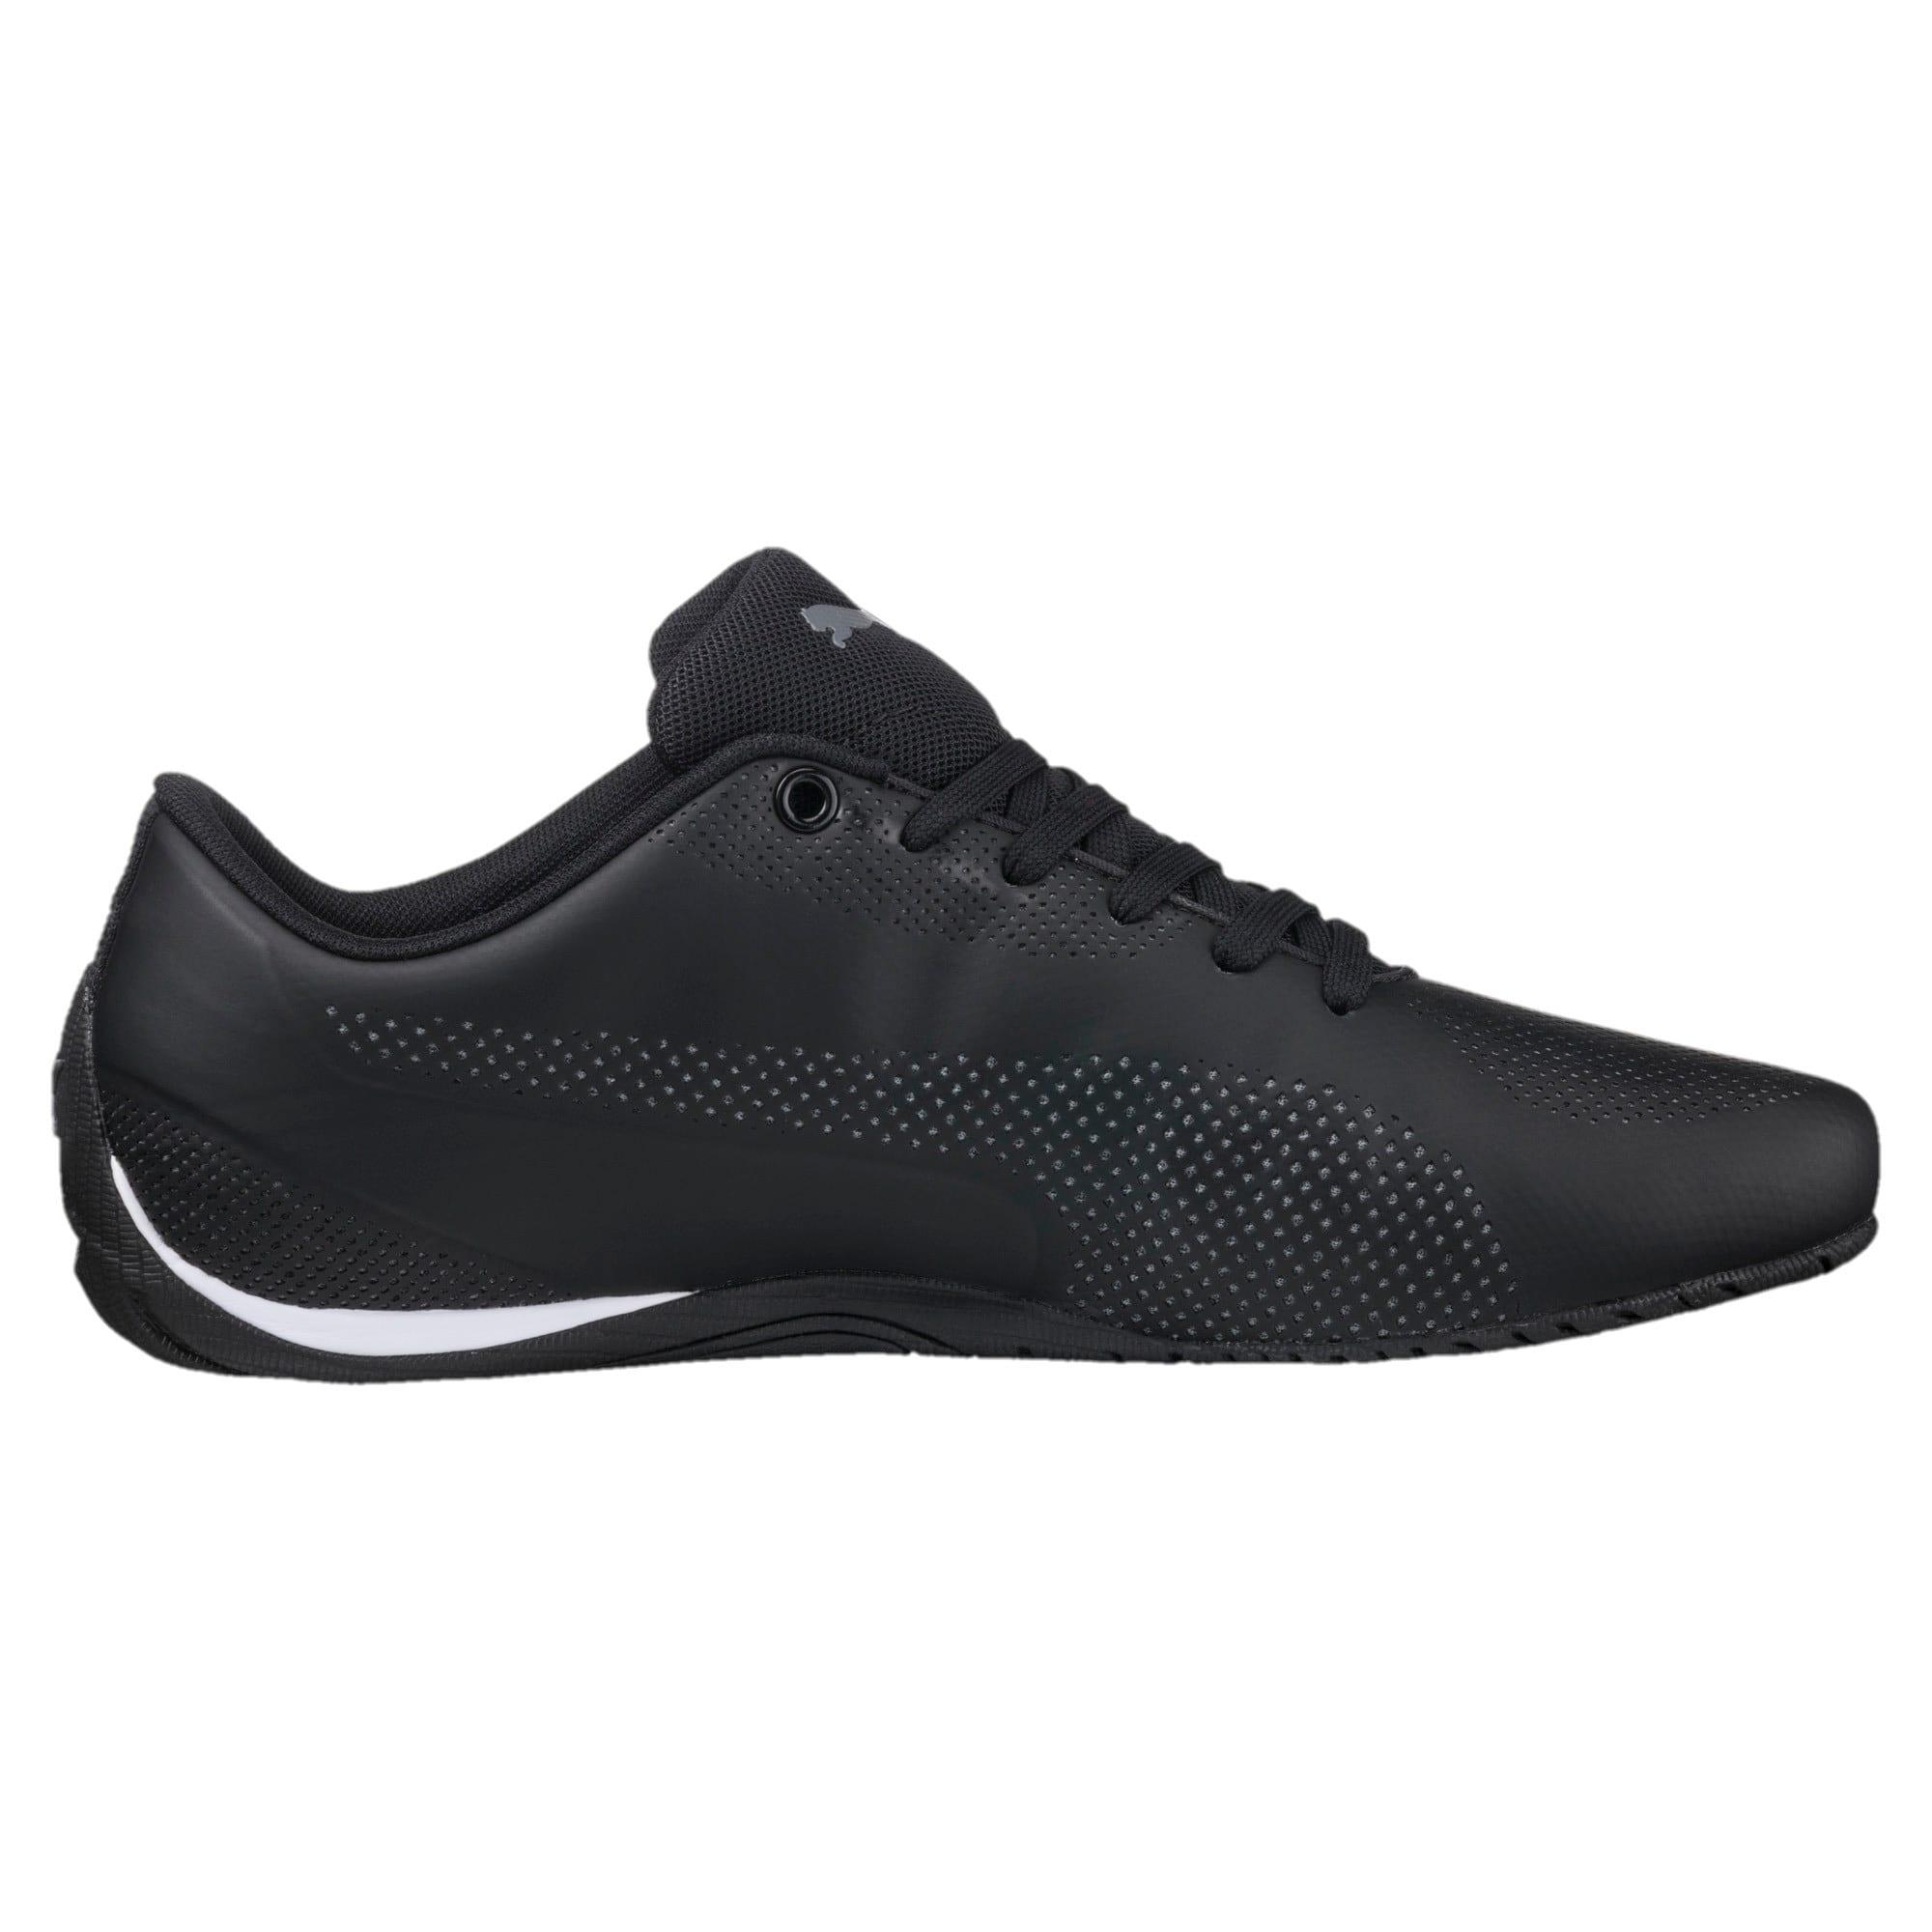 Thumbnail 3 of Drift Cat 5 Ultra Men's Shoes, Puma Black-QUIET SHADE, medium